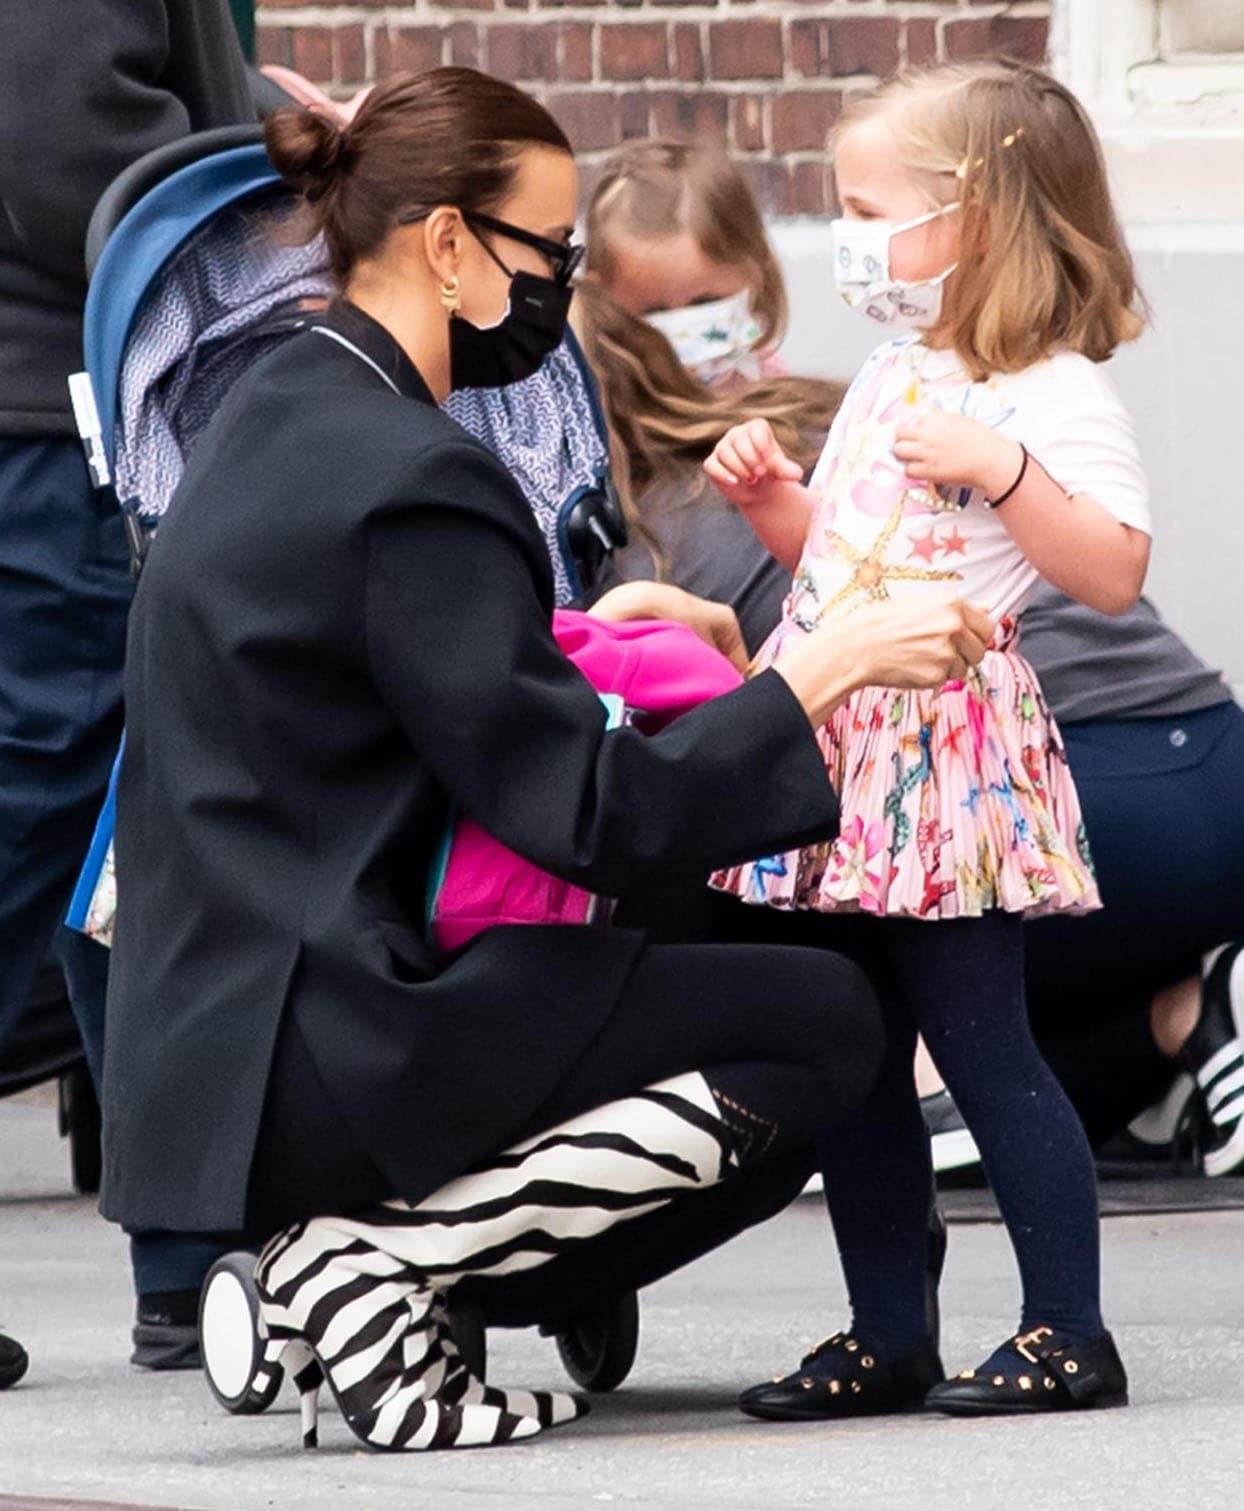 Irina Shayk picks up her daughter, Lea de Seine, from school in New York City on April 14, 2021